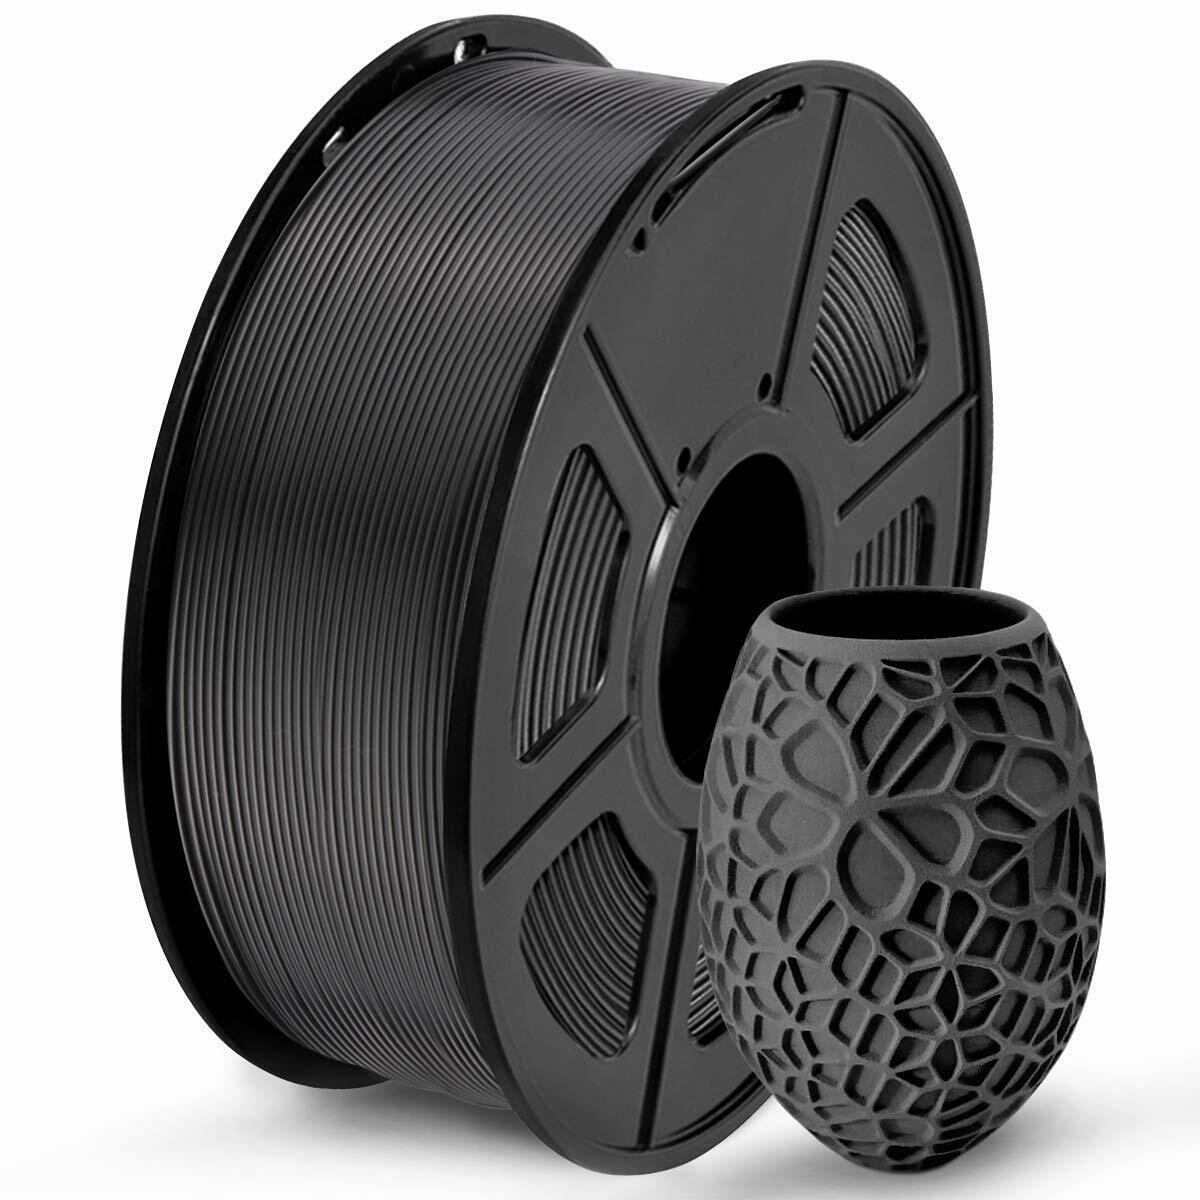 SUNLU PLA 3D Printer Filament, 1.75mm, Accuracy +/- 0.02 Black, 1.0 kg spool